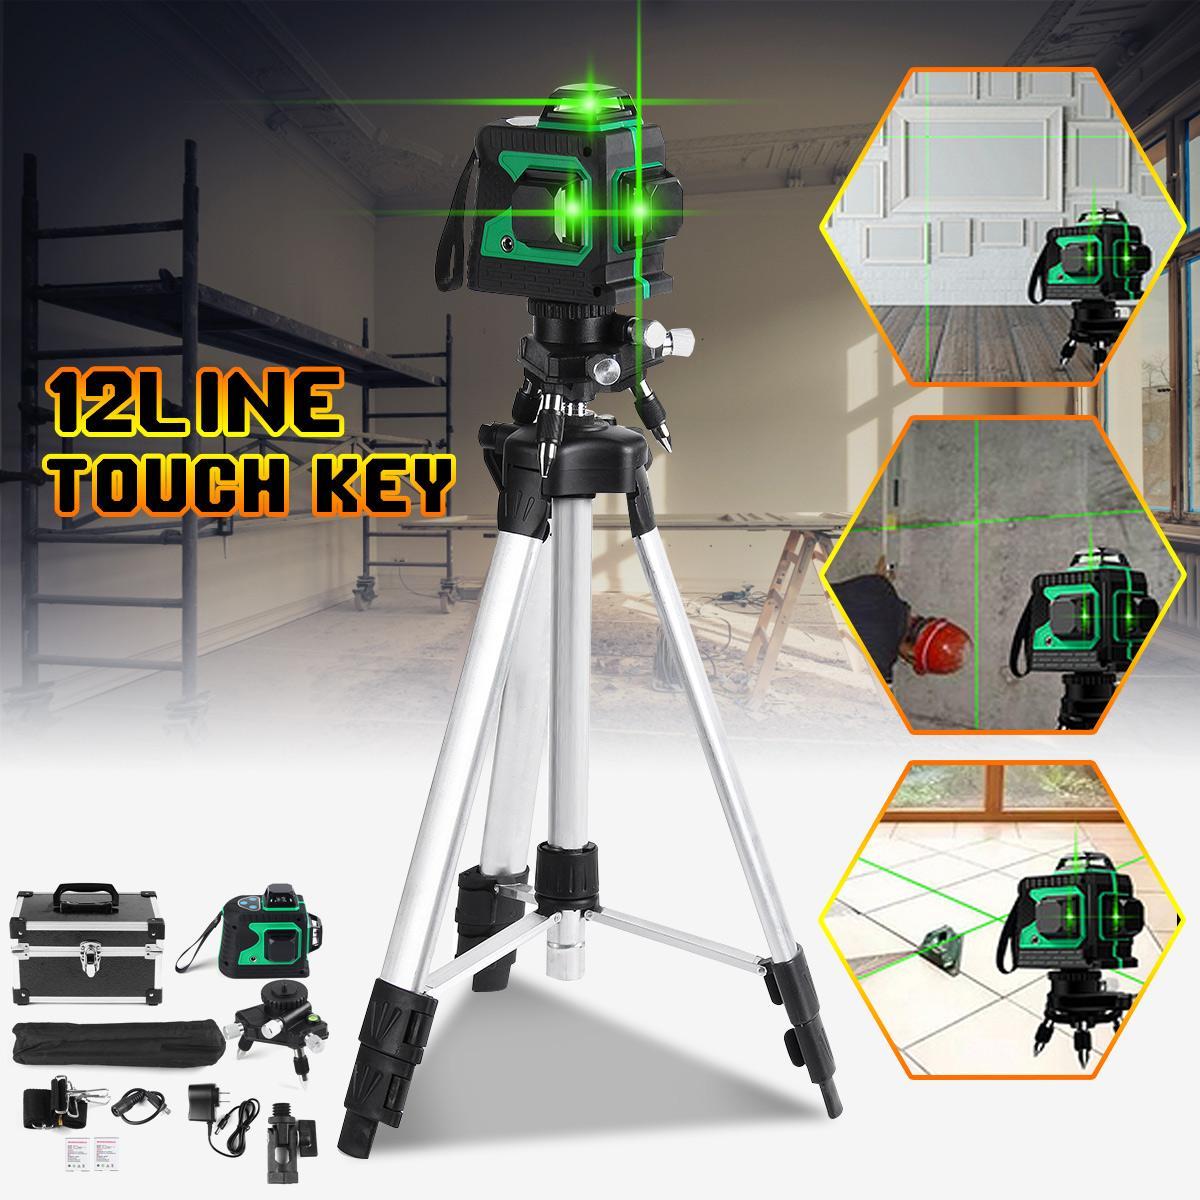 4 8 12 Line 3D Green Light Laser Level Measure Self Leveling 360 Horizontal Vertical Cross